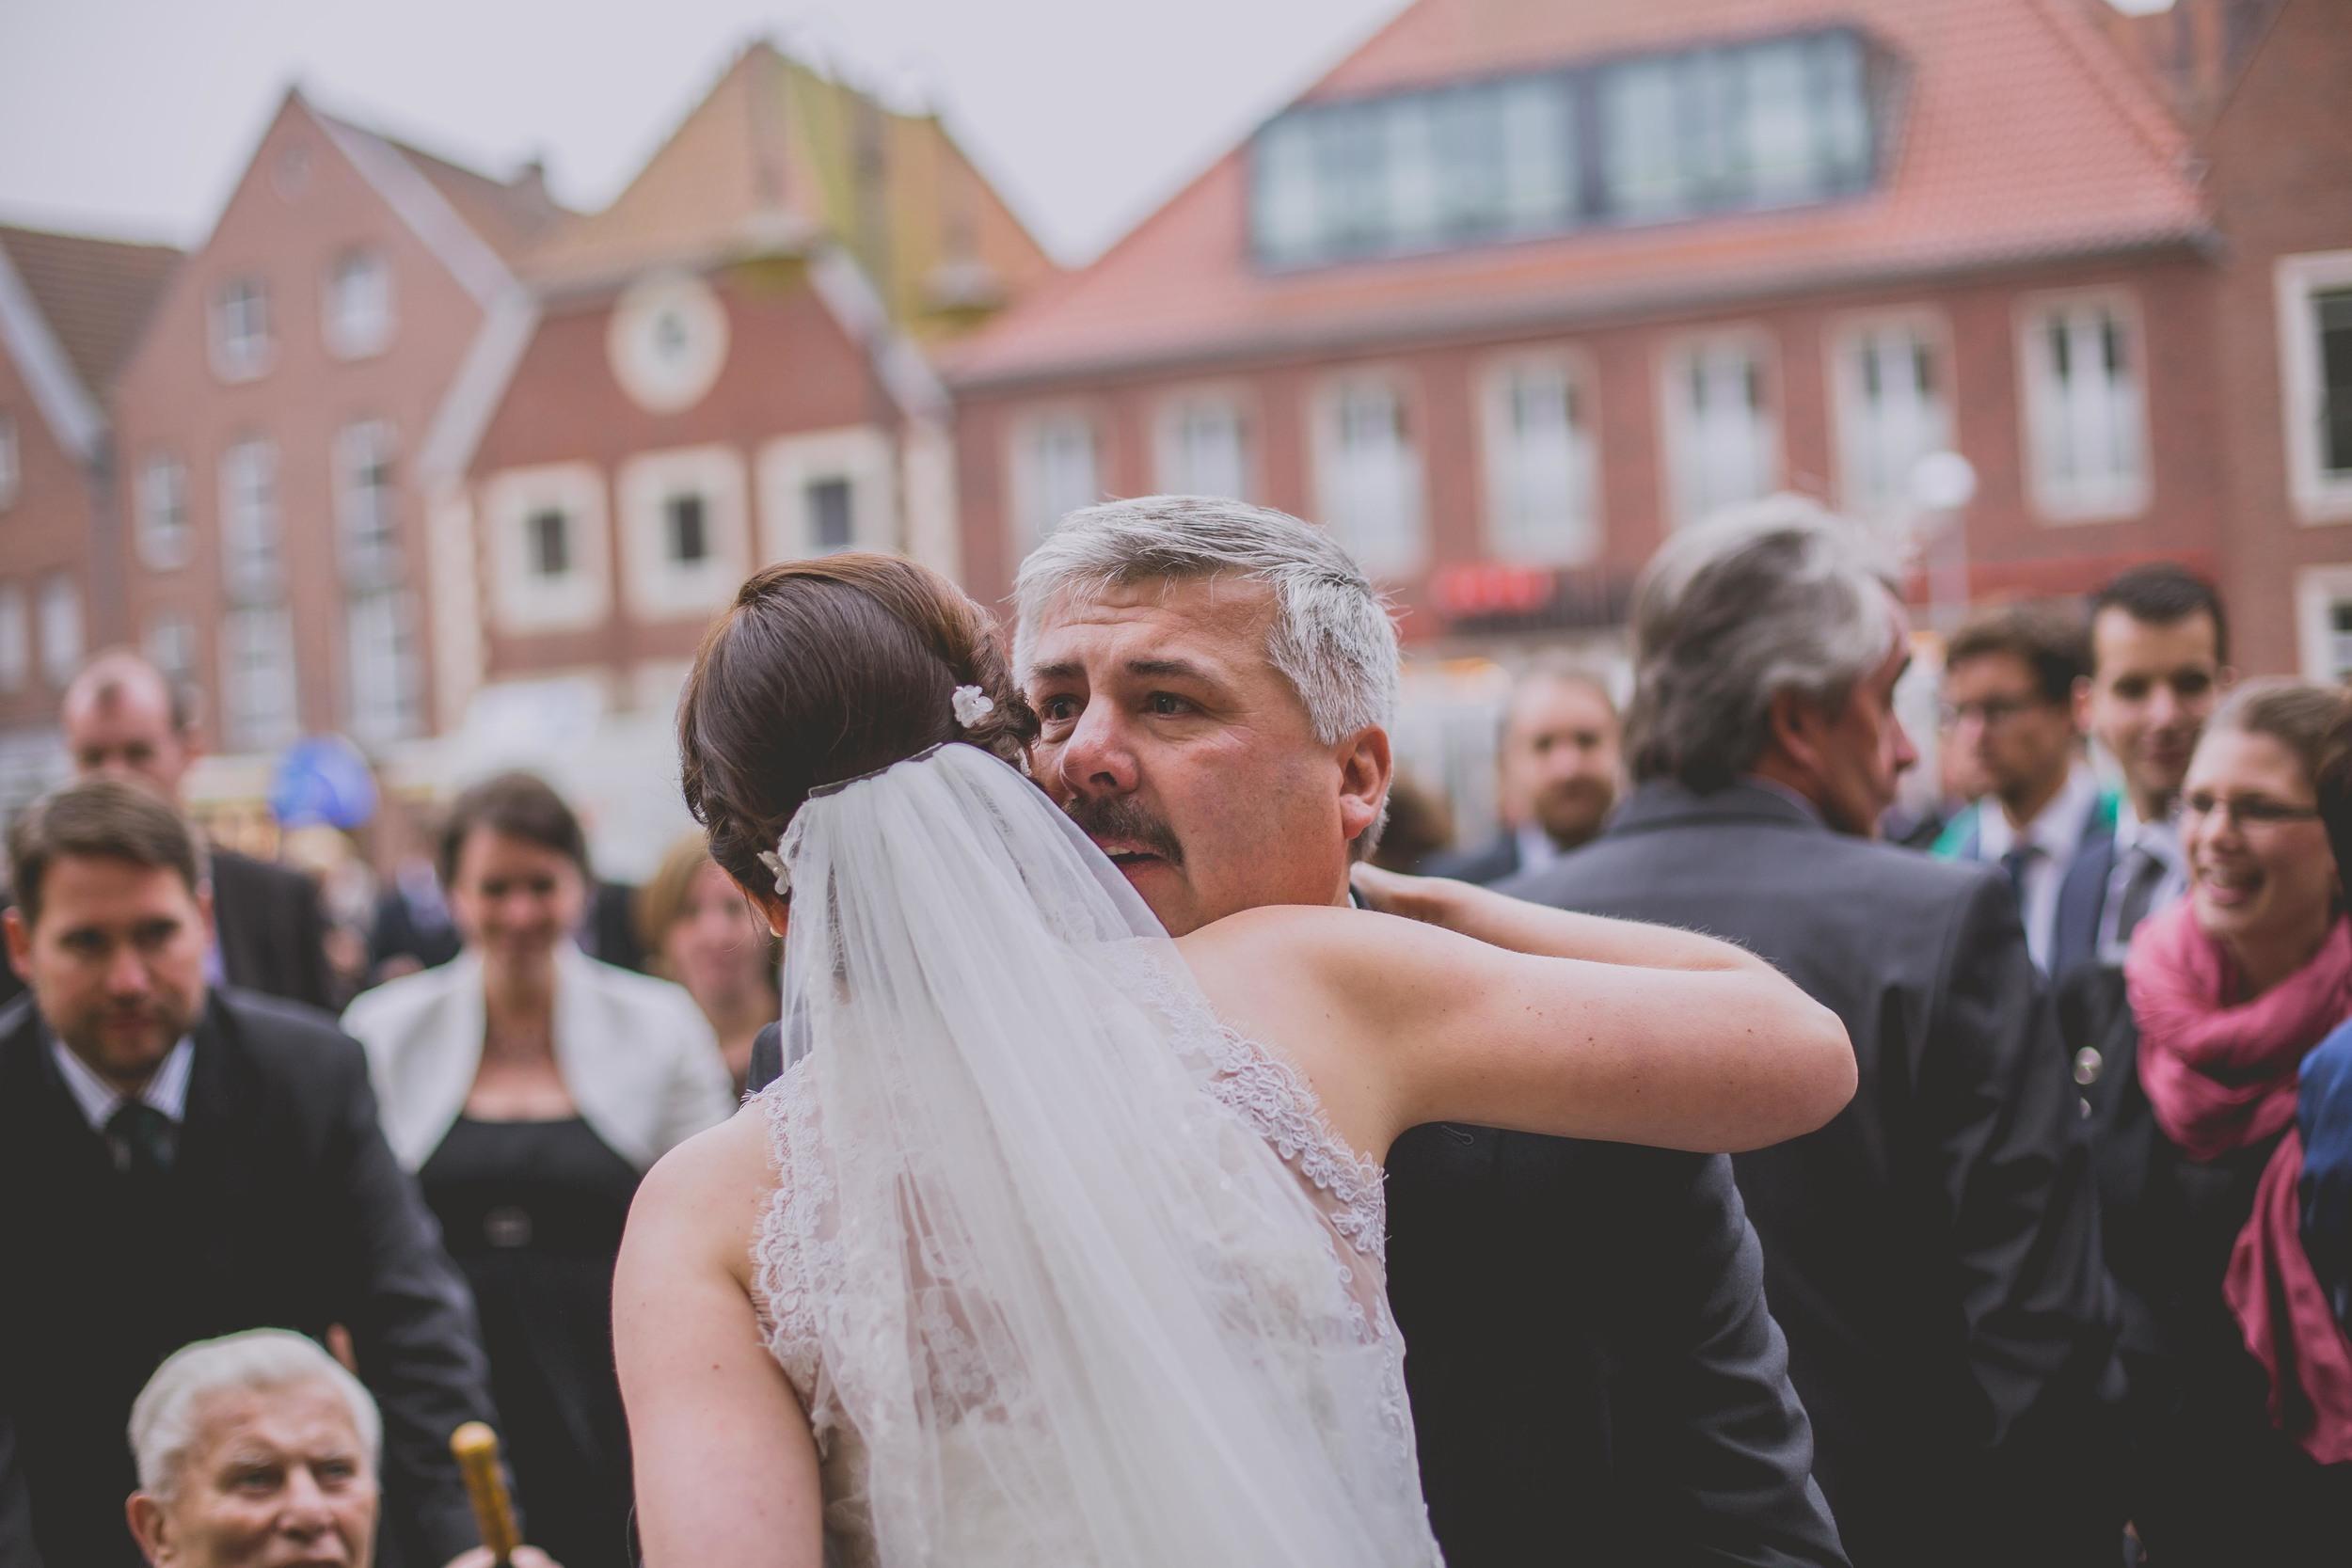 Buffalo-Wedding-Photography-by-Stefan-Ludwig10252014WEB-55.jpg